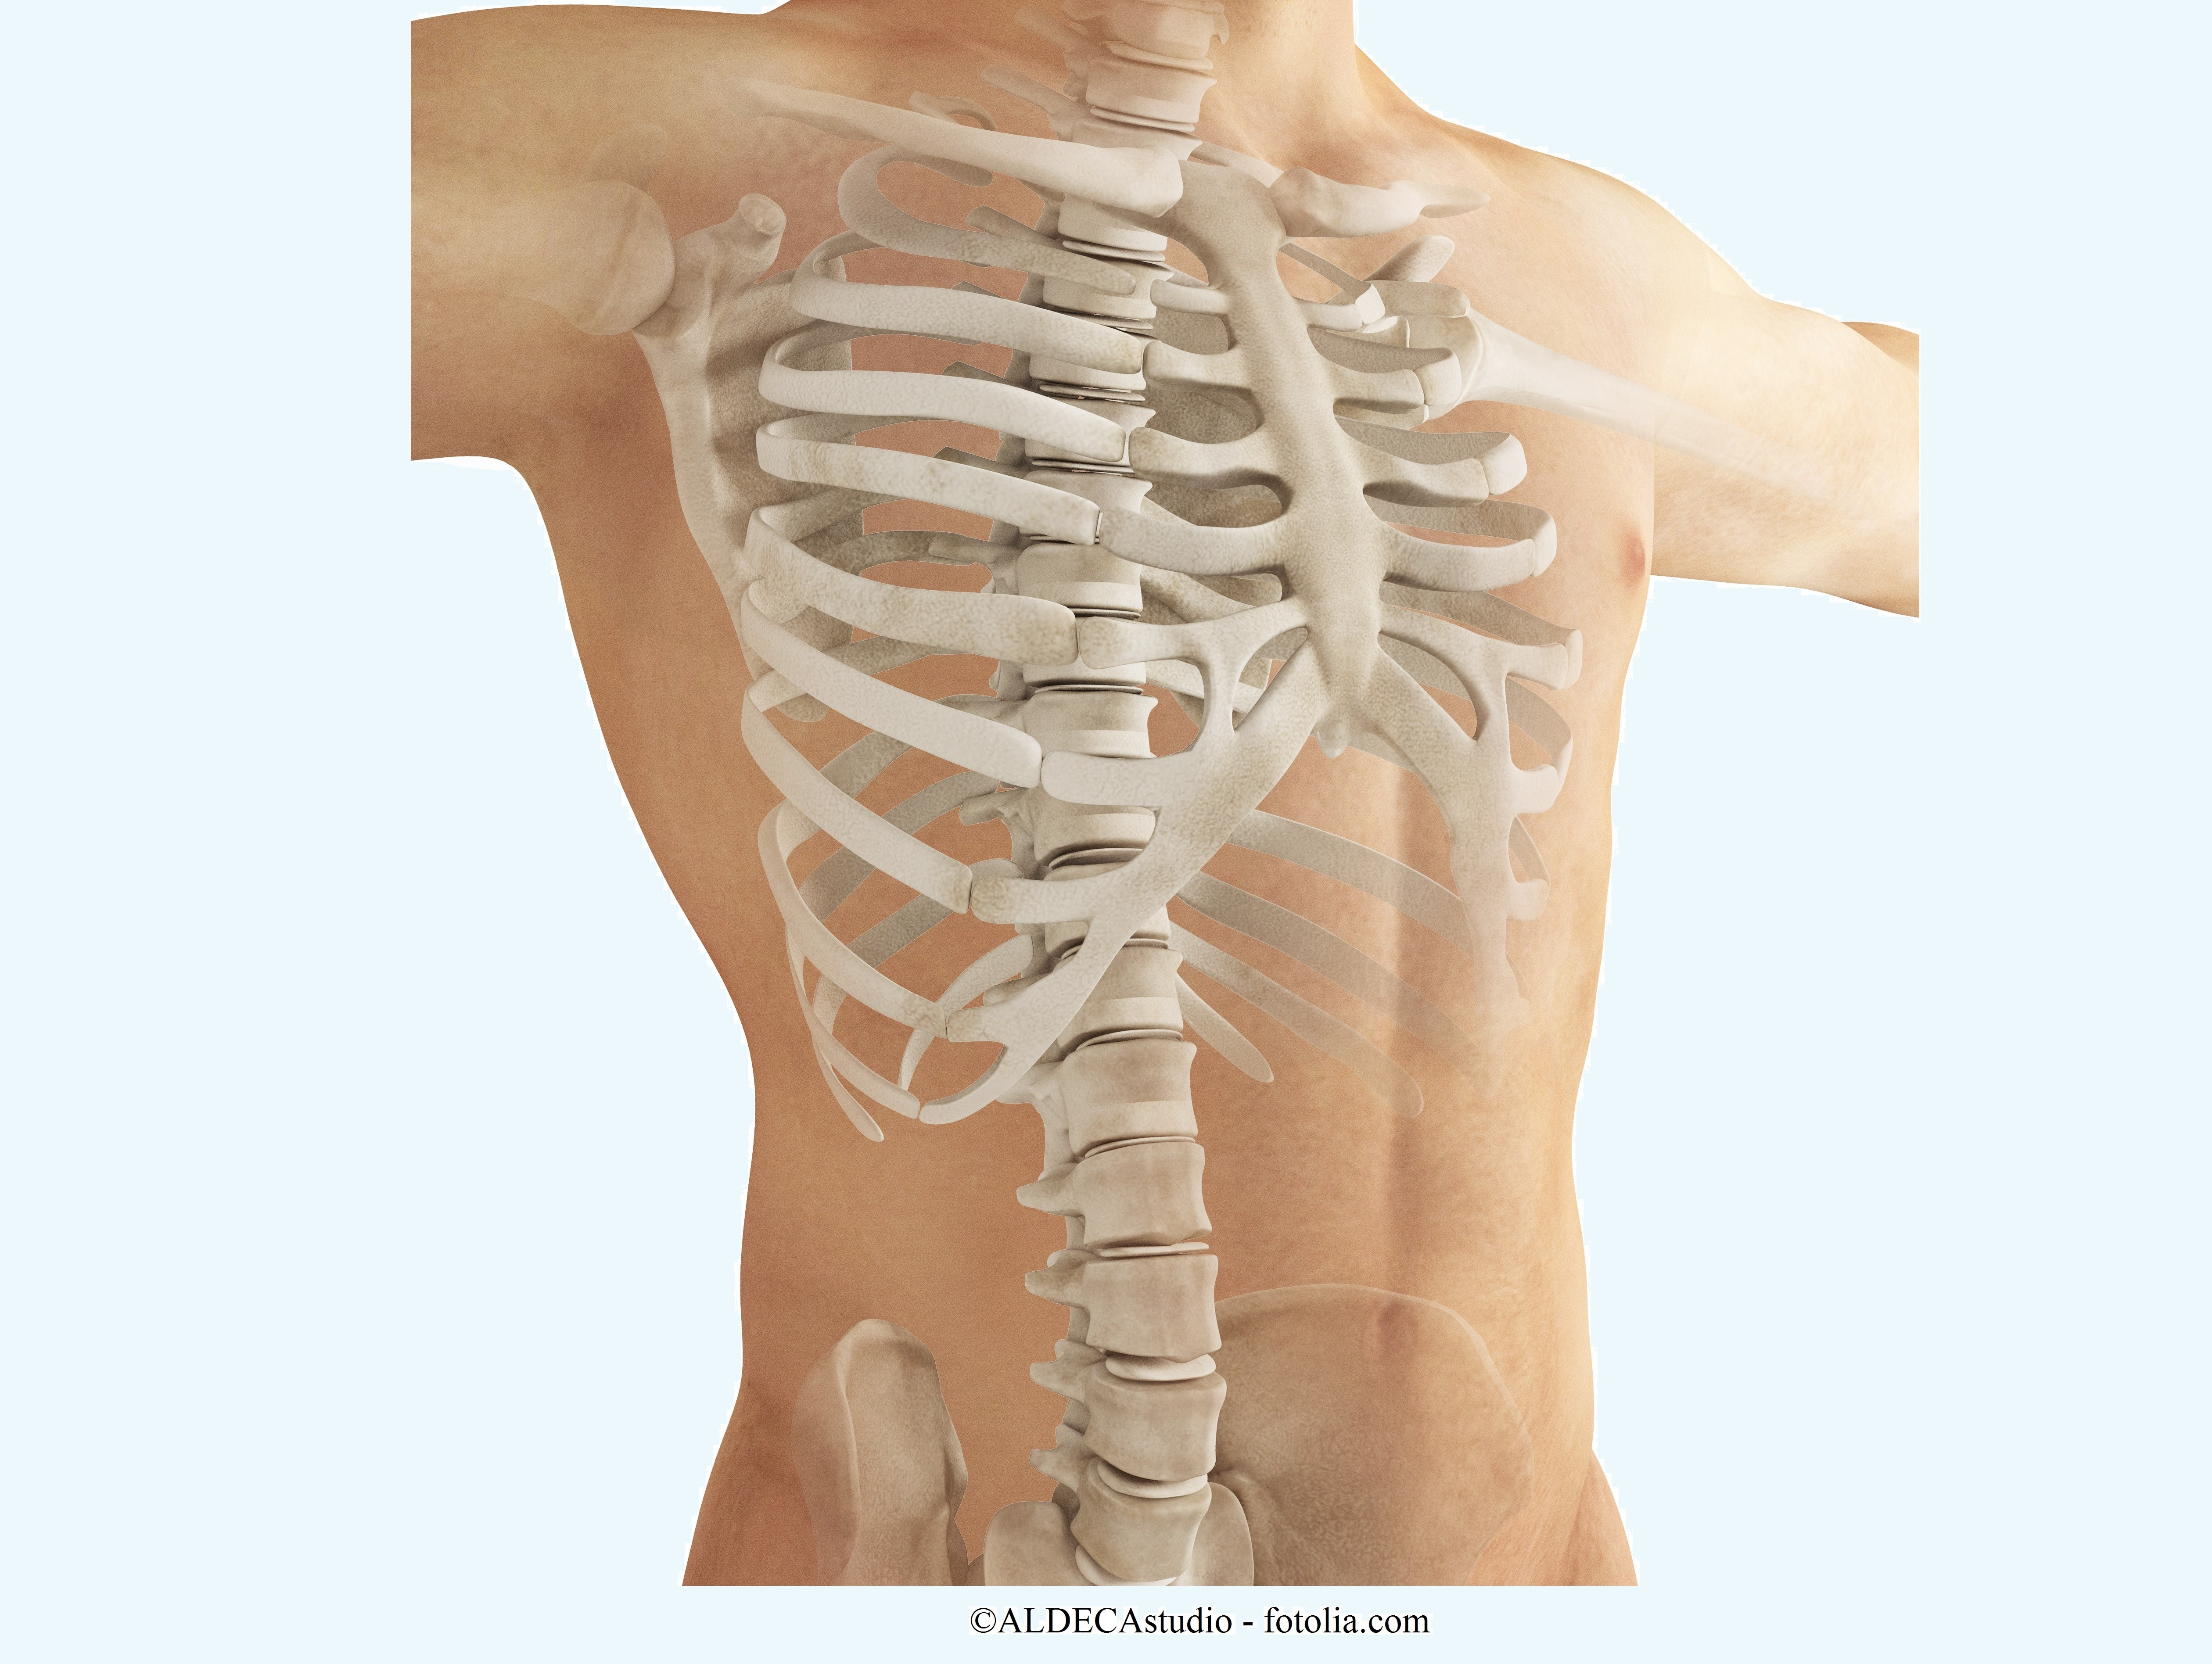 Knochenmetastasen